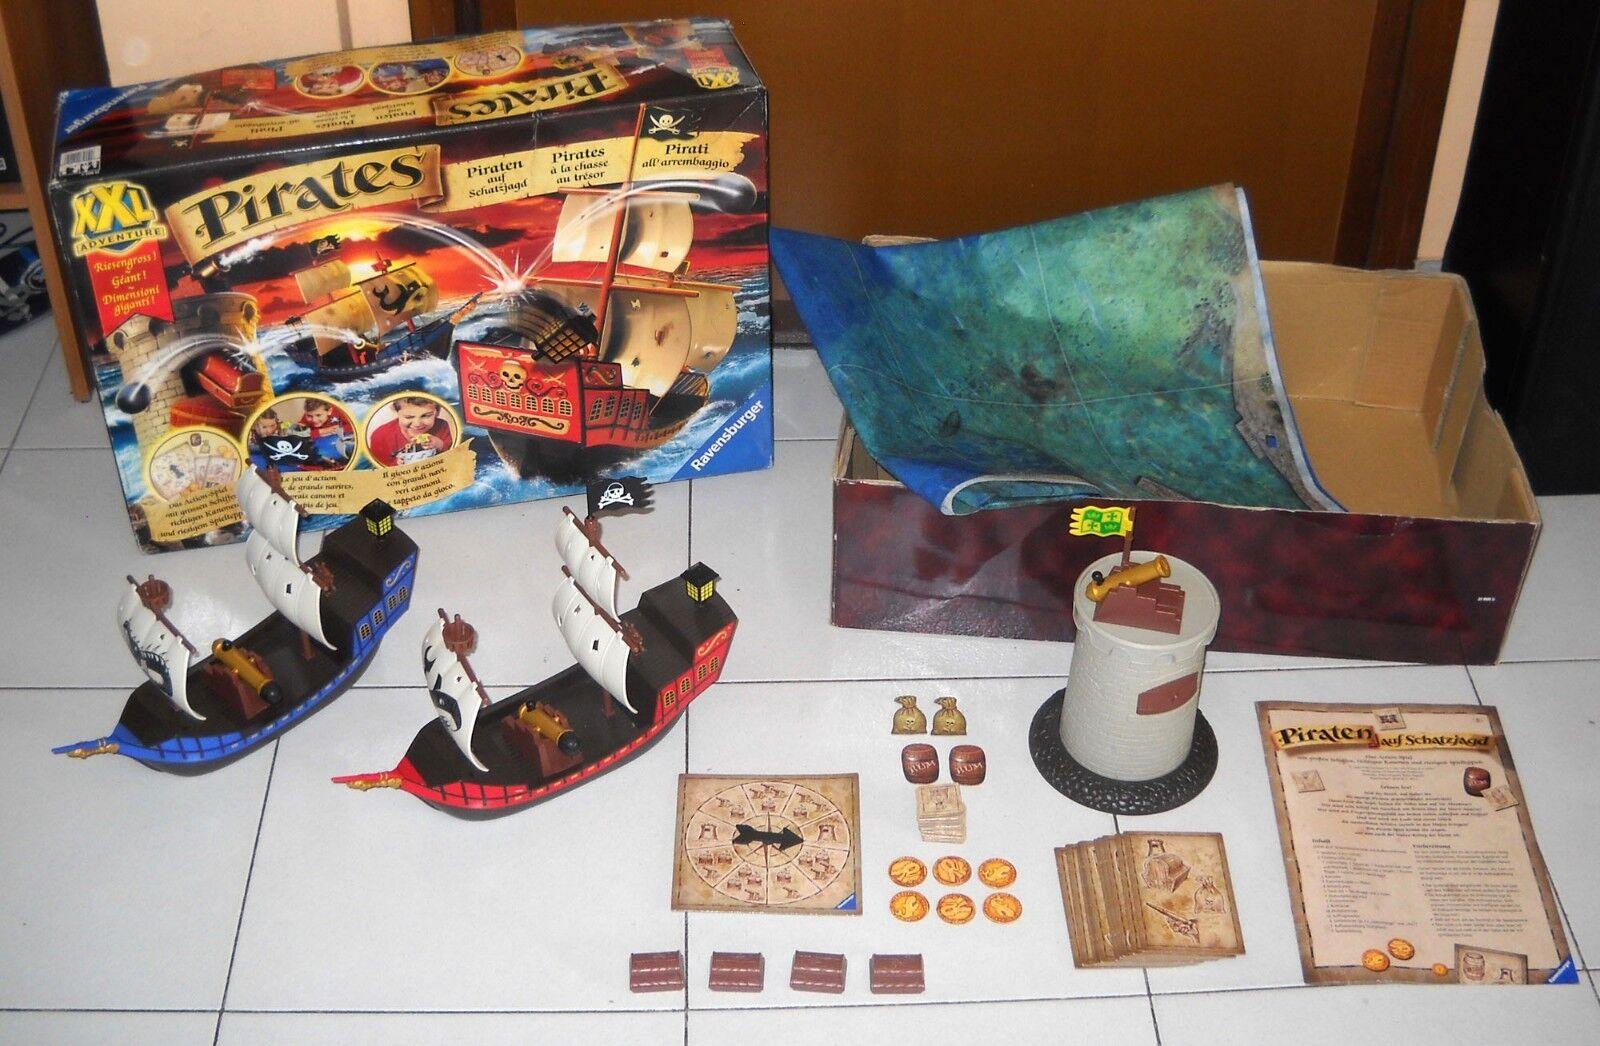 PIRATES pirates all' embarqueHommes embarqueHommes embarqueHommes t Ravensburger XXL 2006 Piraten On the high seas 4e820e